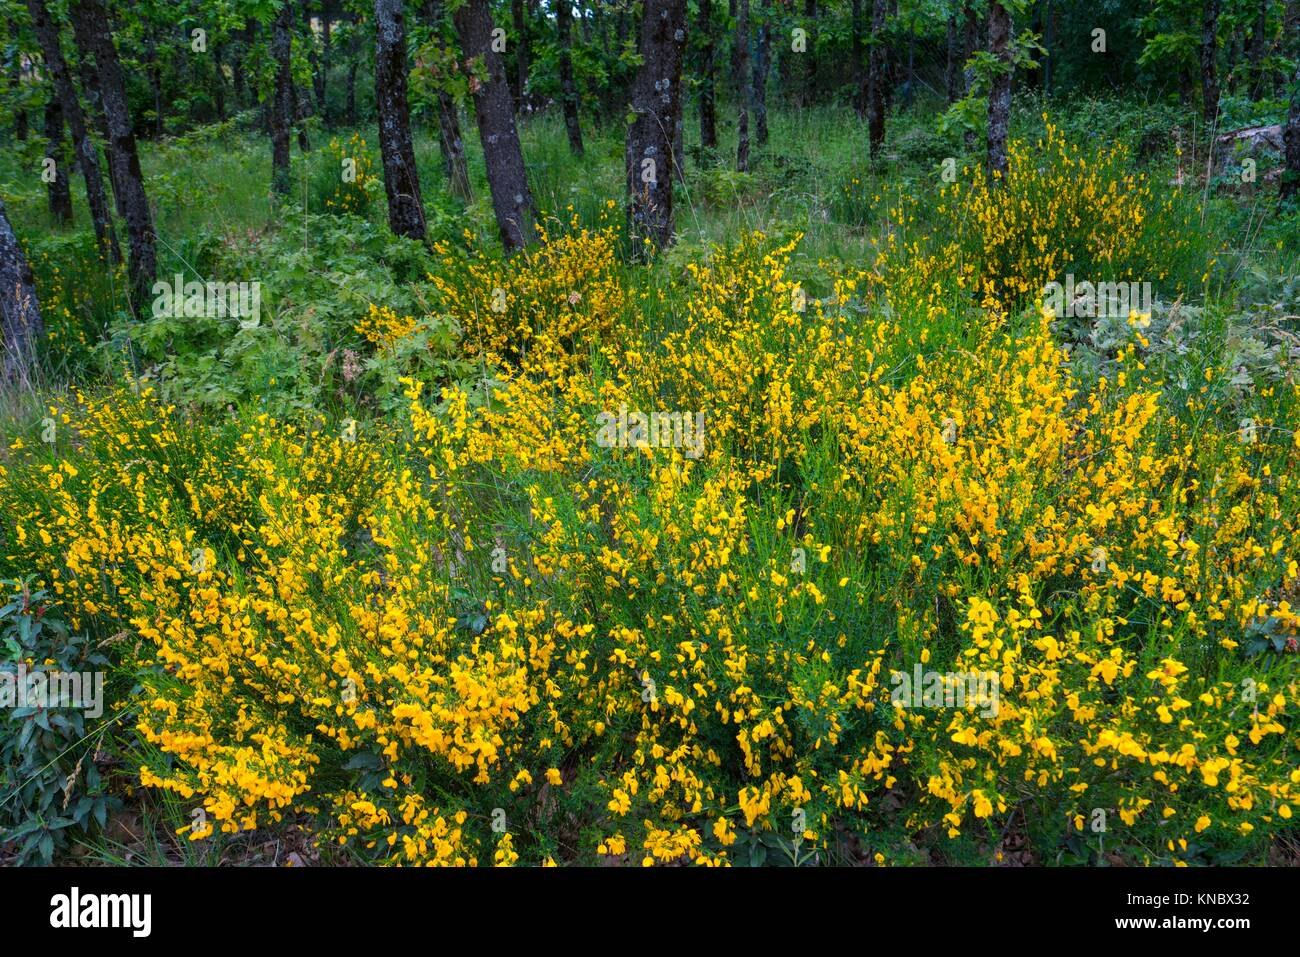 Pyrenean Oak forest and Common Broom, Sierra de Guadarrama, Madrid, Spain, Europe. Stock Photo